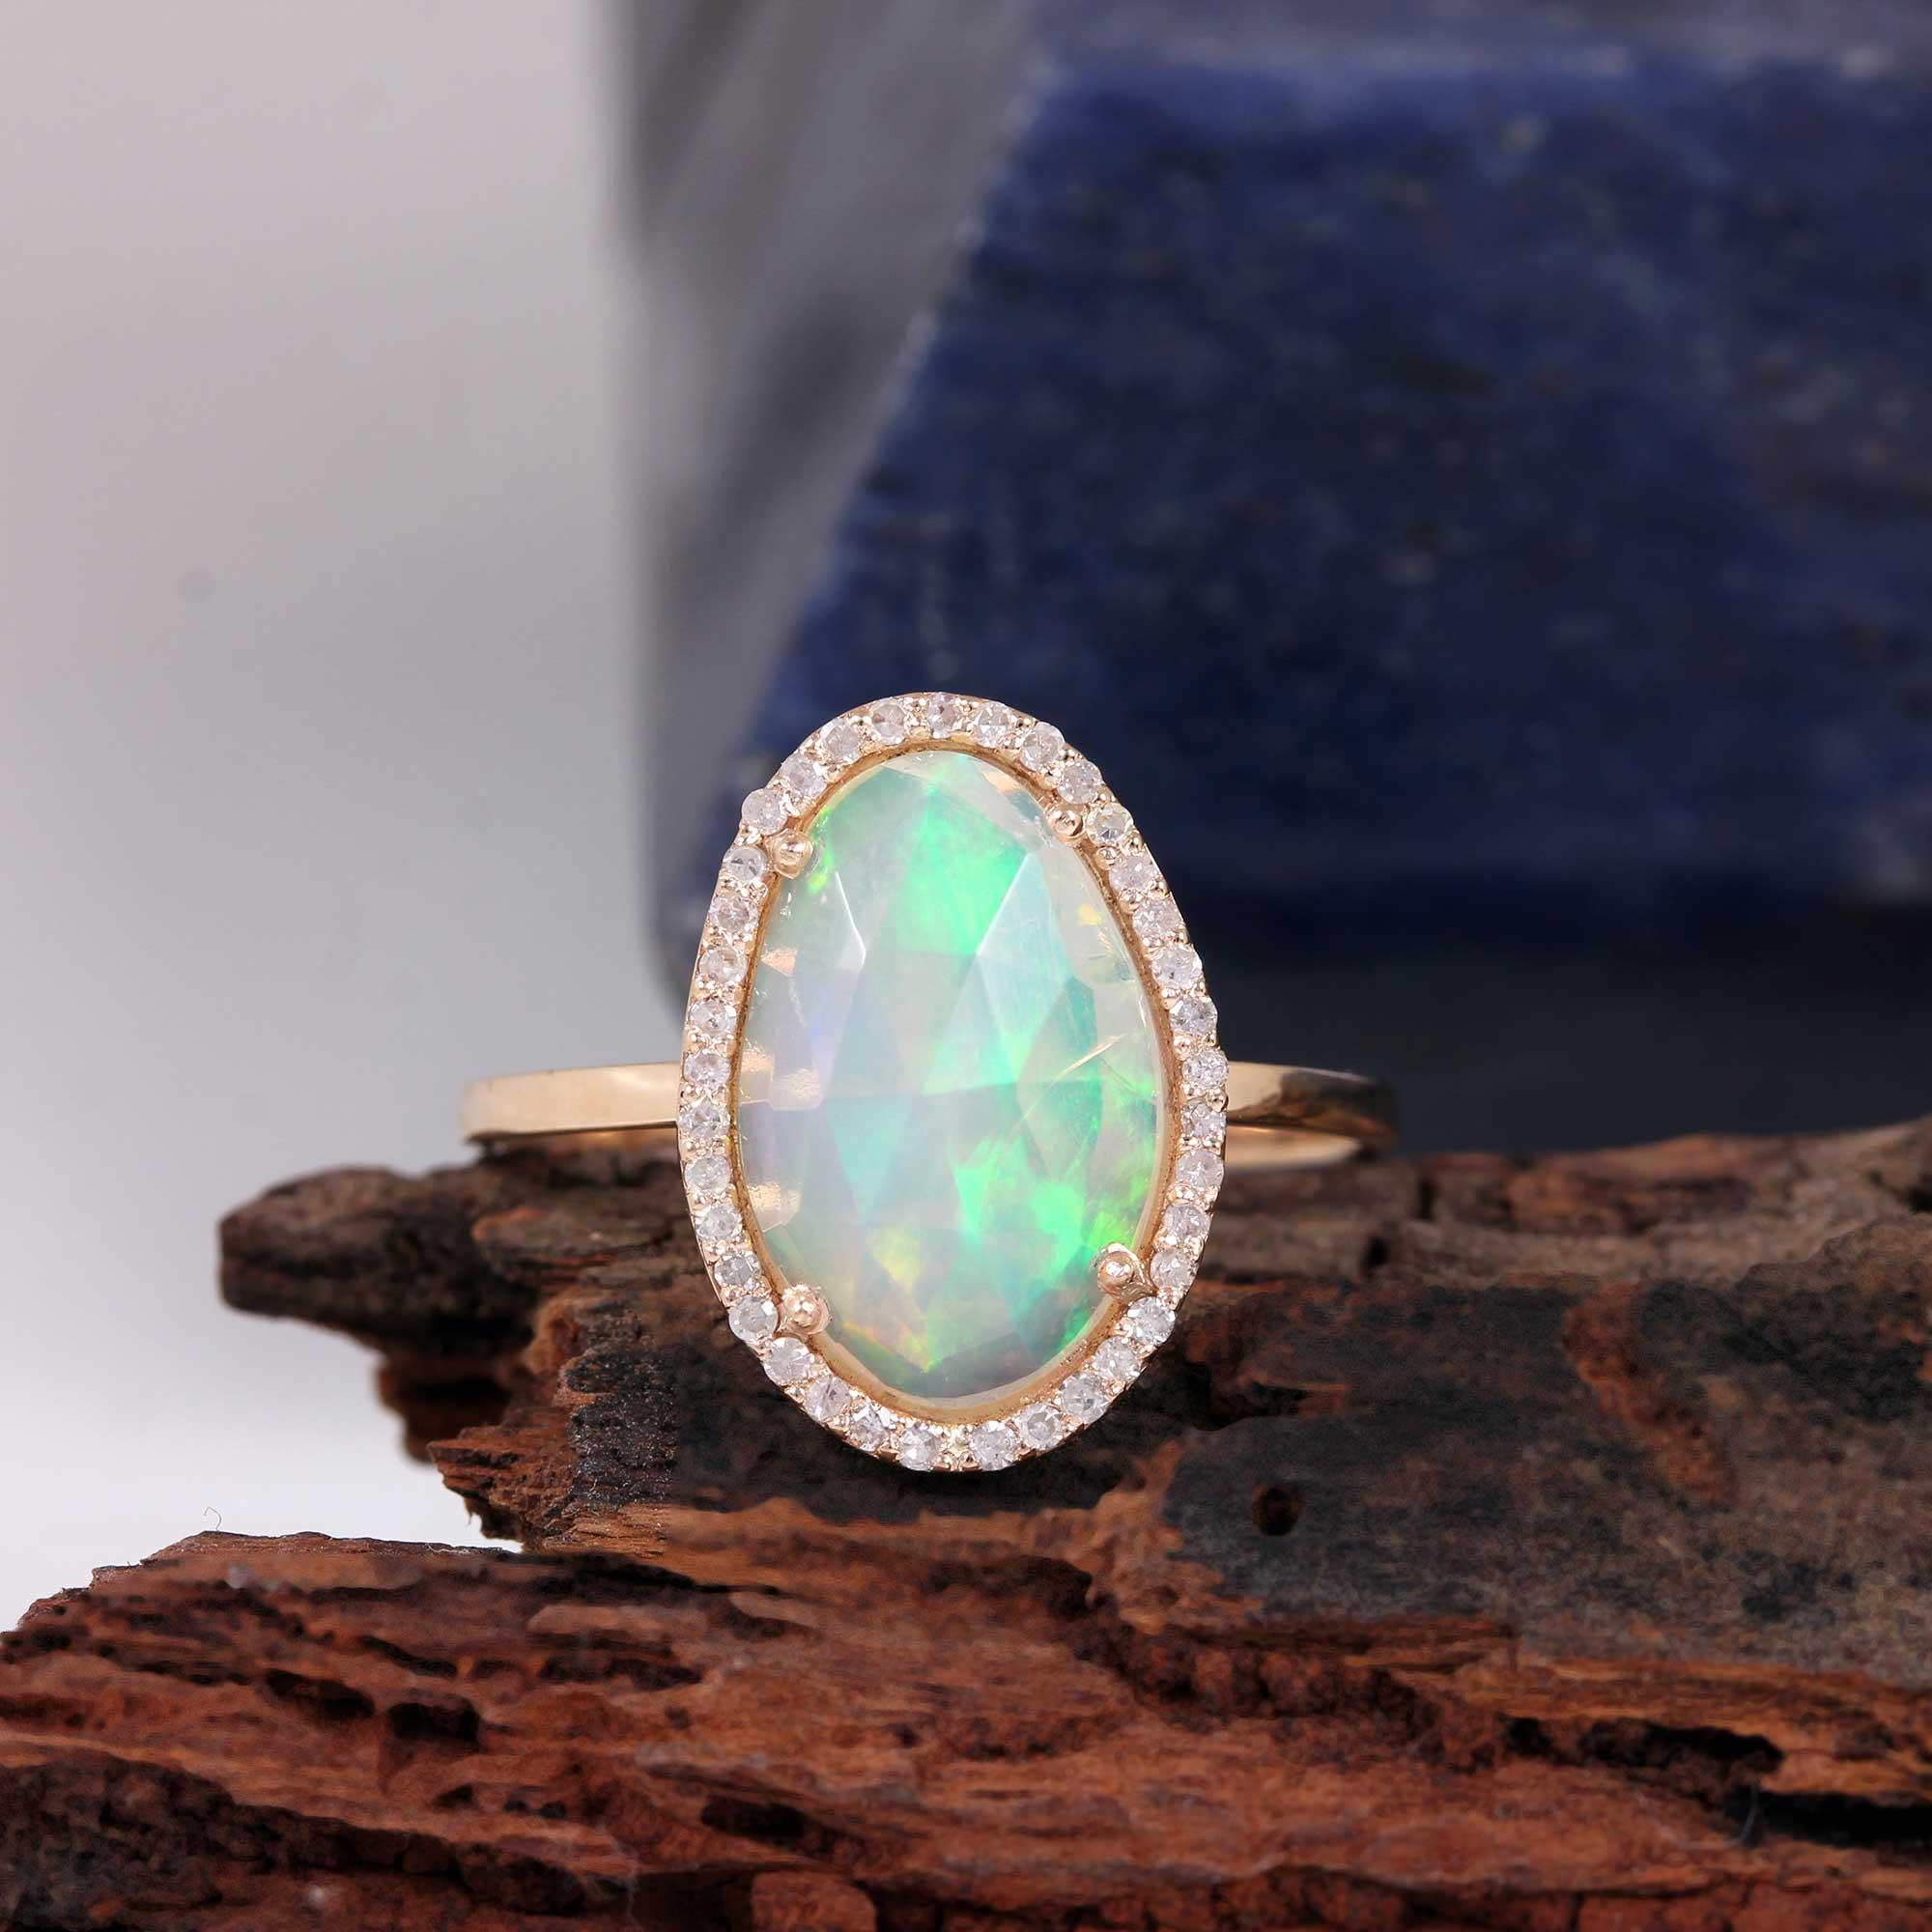 Gemstone Opal Diamond Solid 14K Gold Ring Jewelry